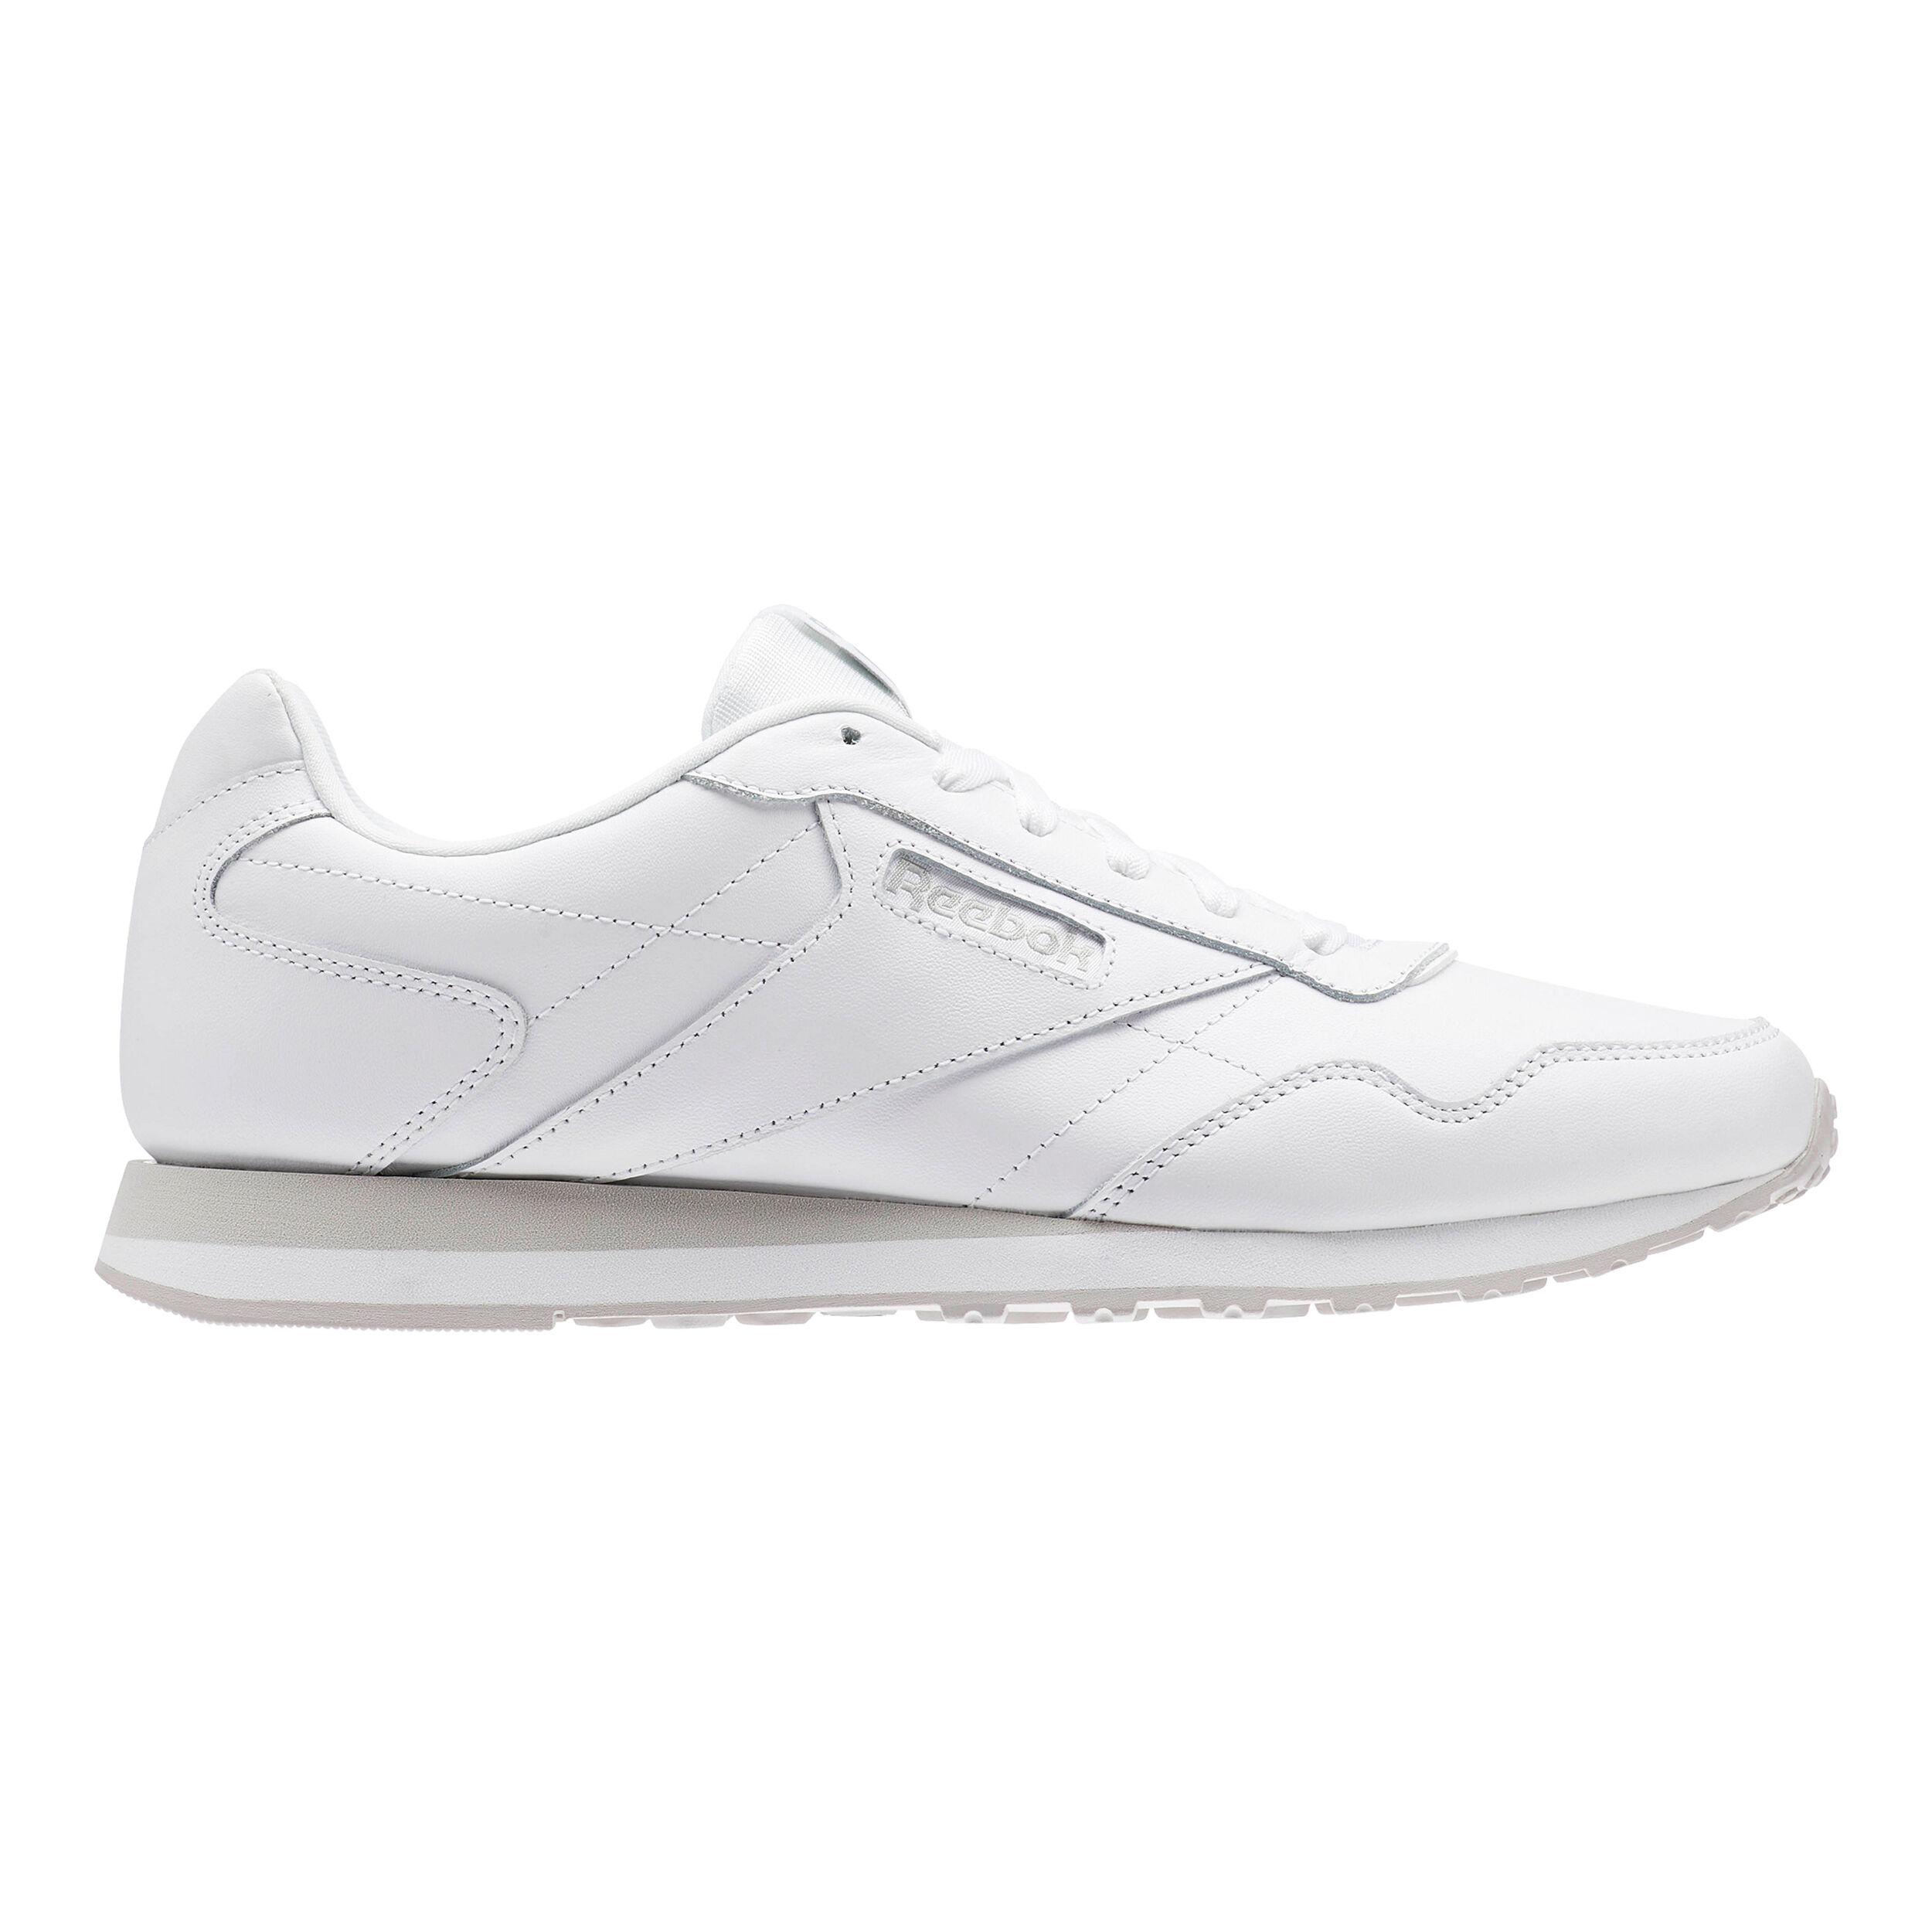 Reebok Royal Glide LX Sneaker Herren Weiß, Hellgrau online